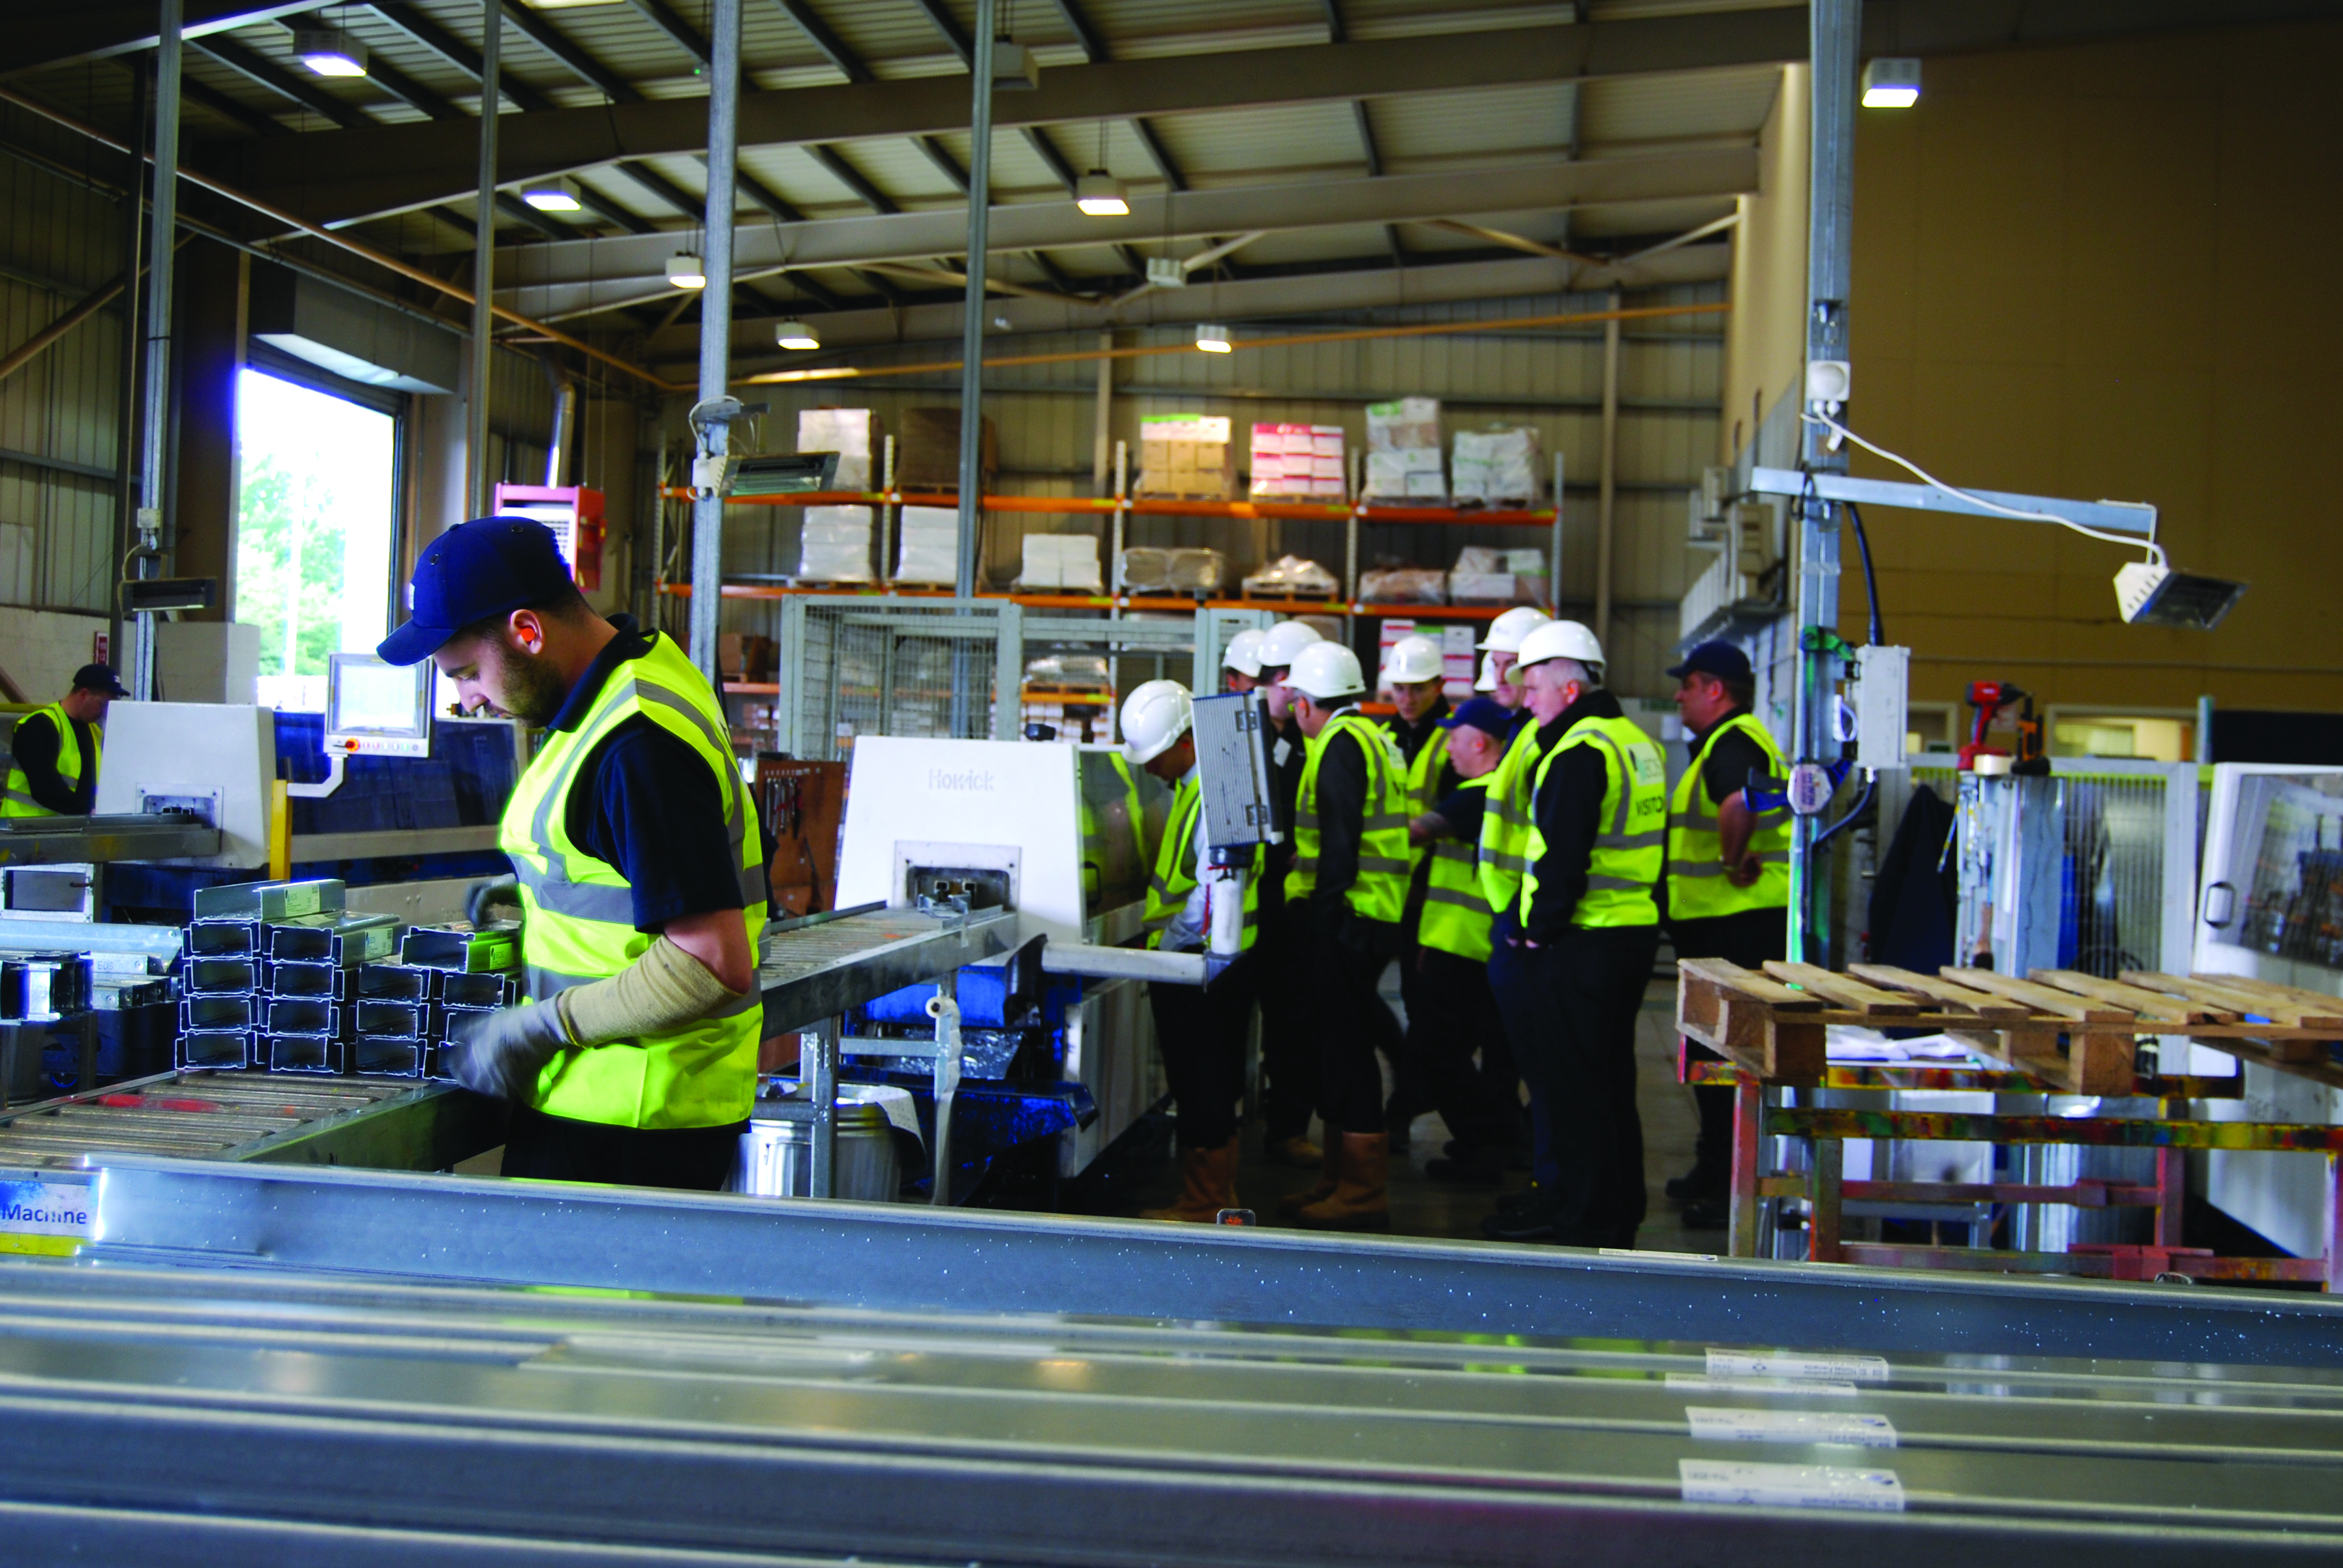 EOS factory tour